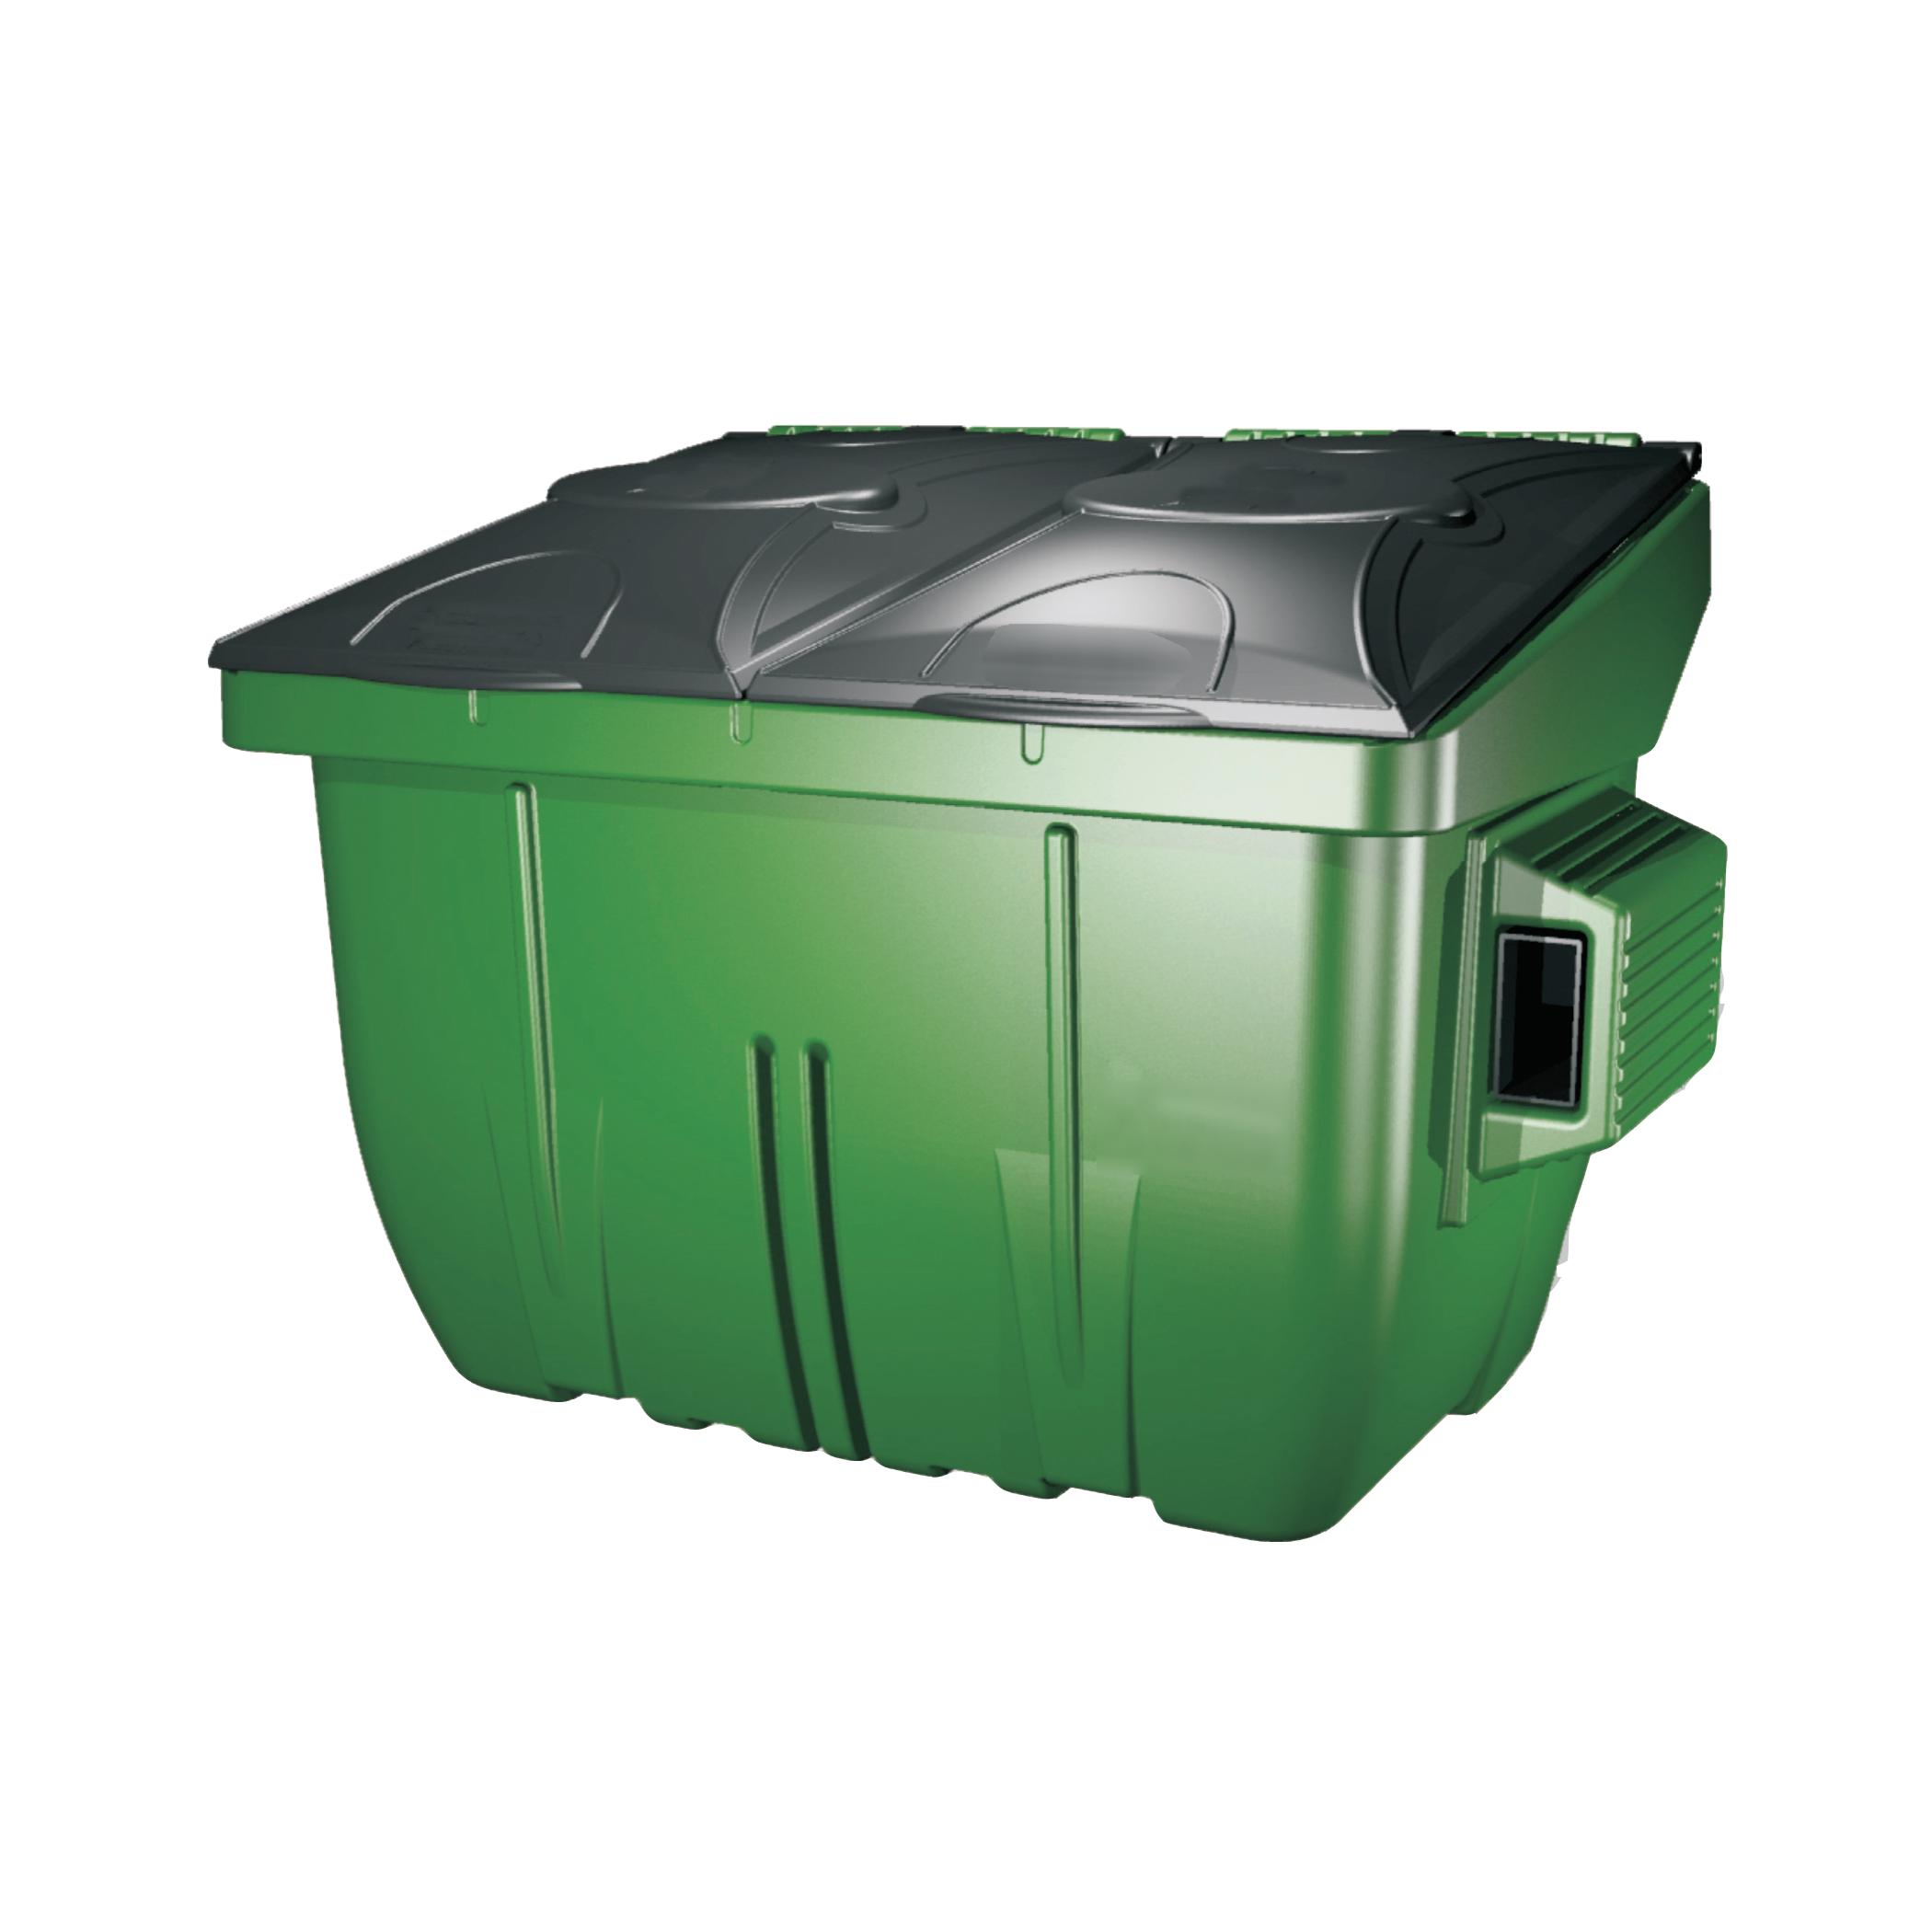 4 yard waste management dumpster dpi plastic carts - Garden waste containers ...